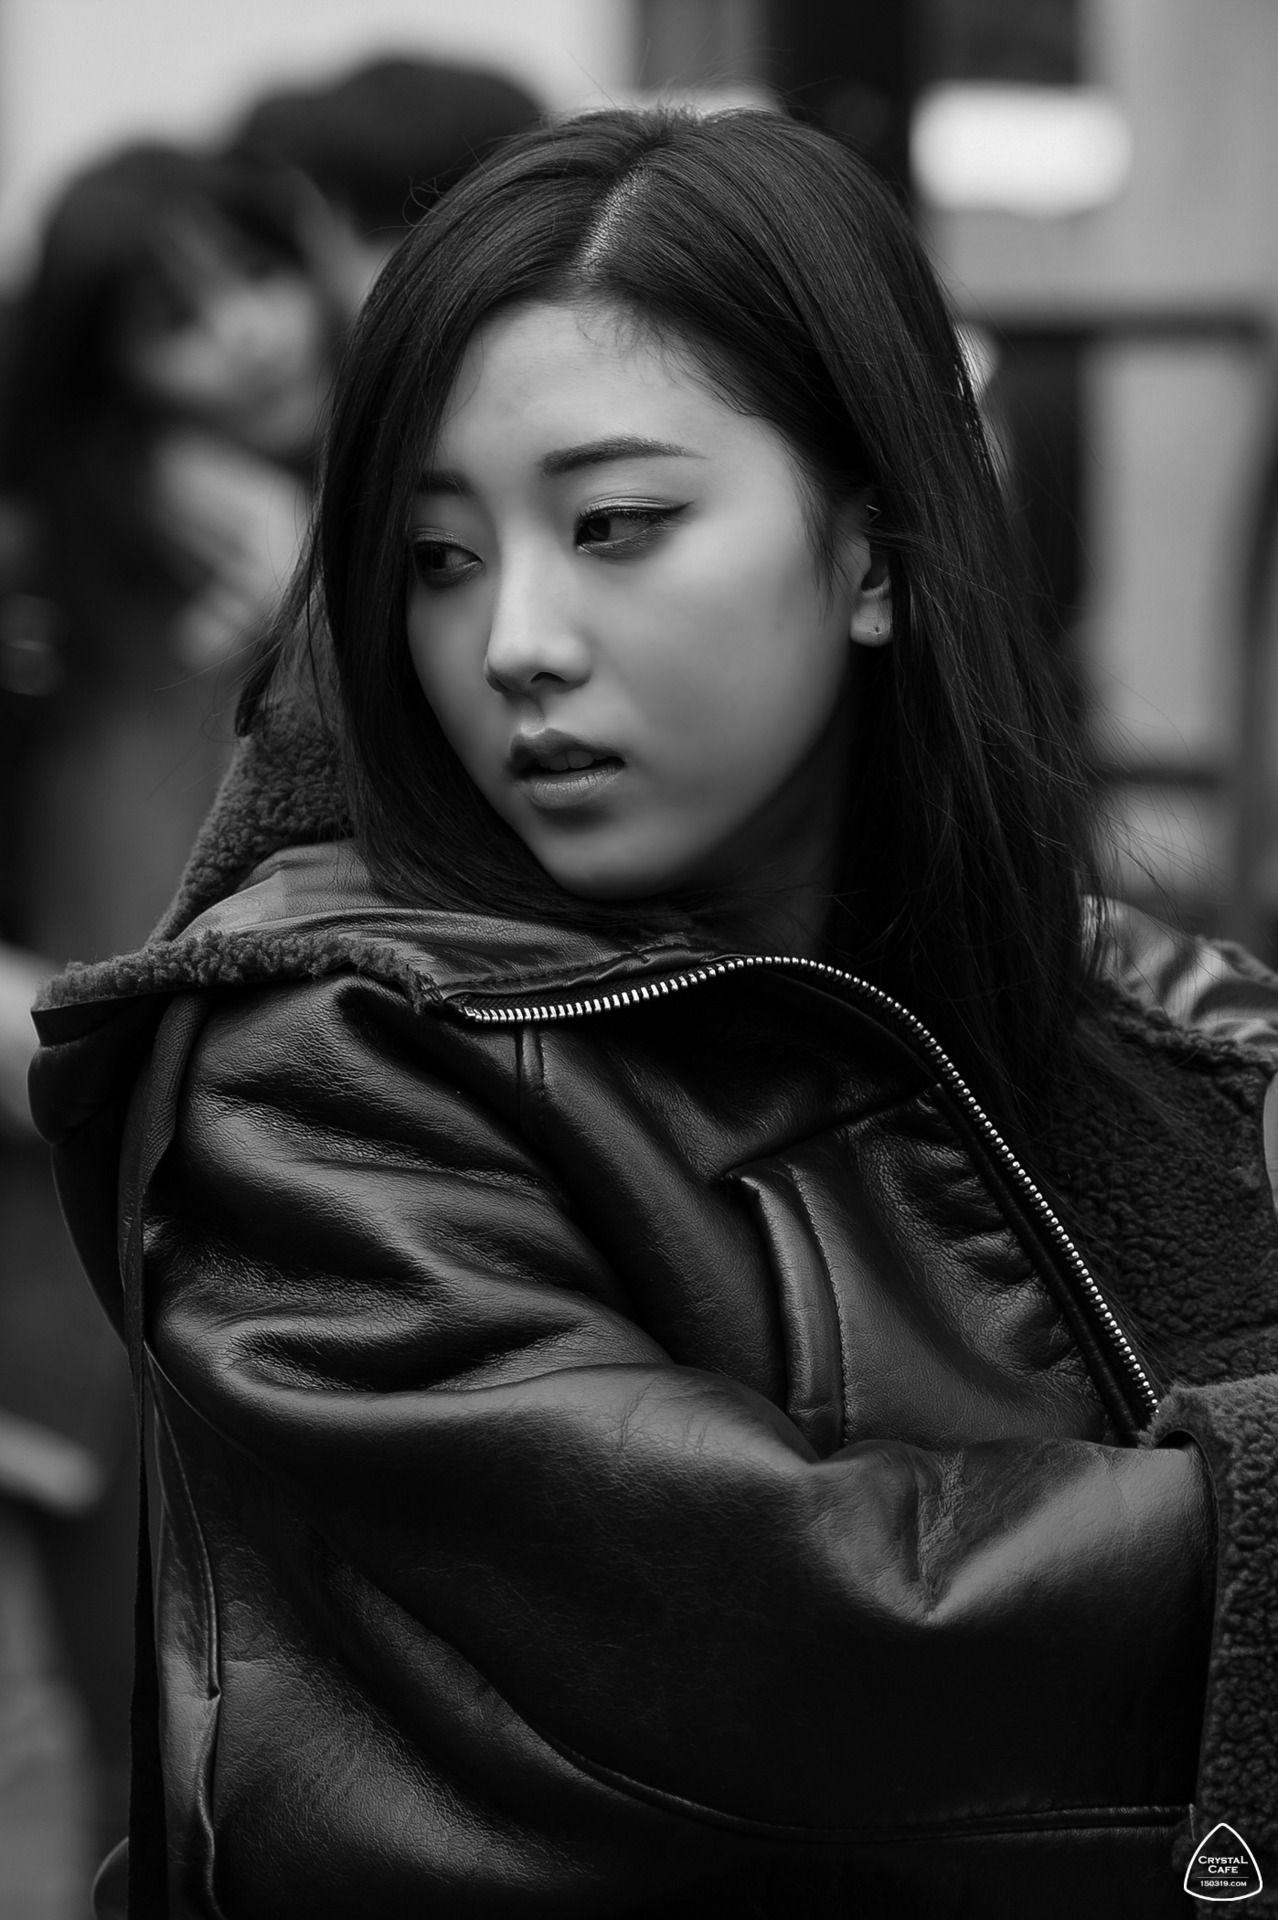 Dedicated To Female Kpop Idols Clc Kpop Girls Street Style Summer Outfits